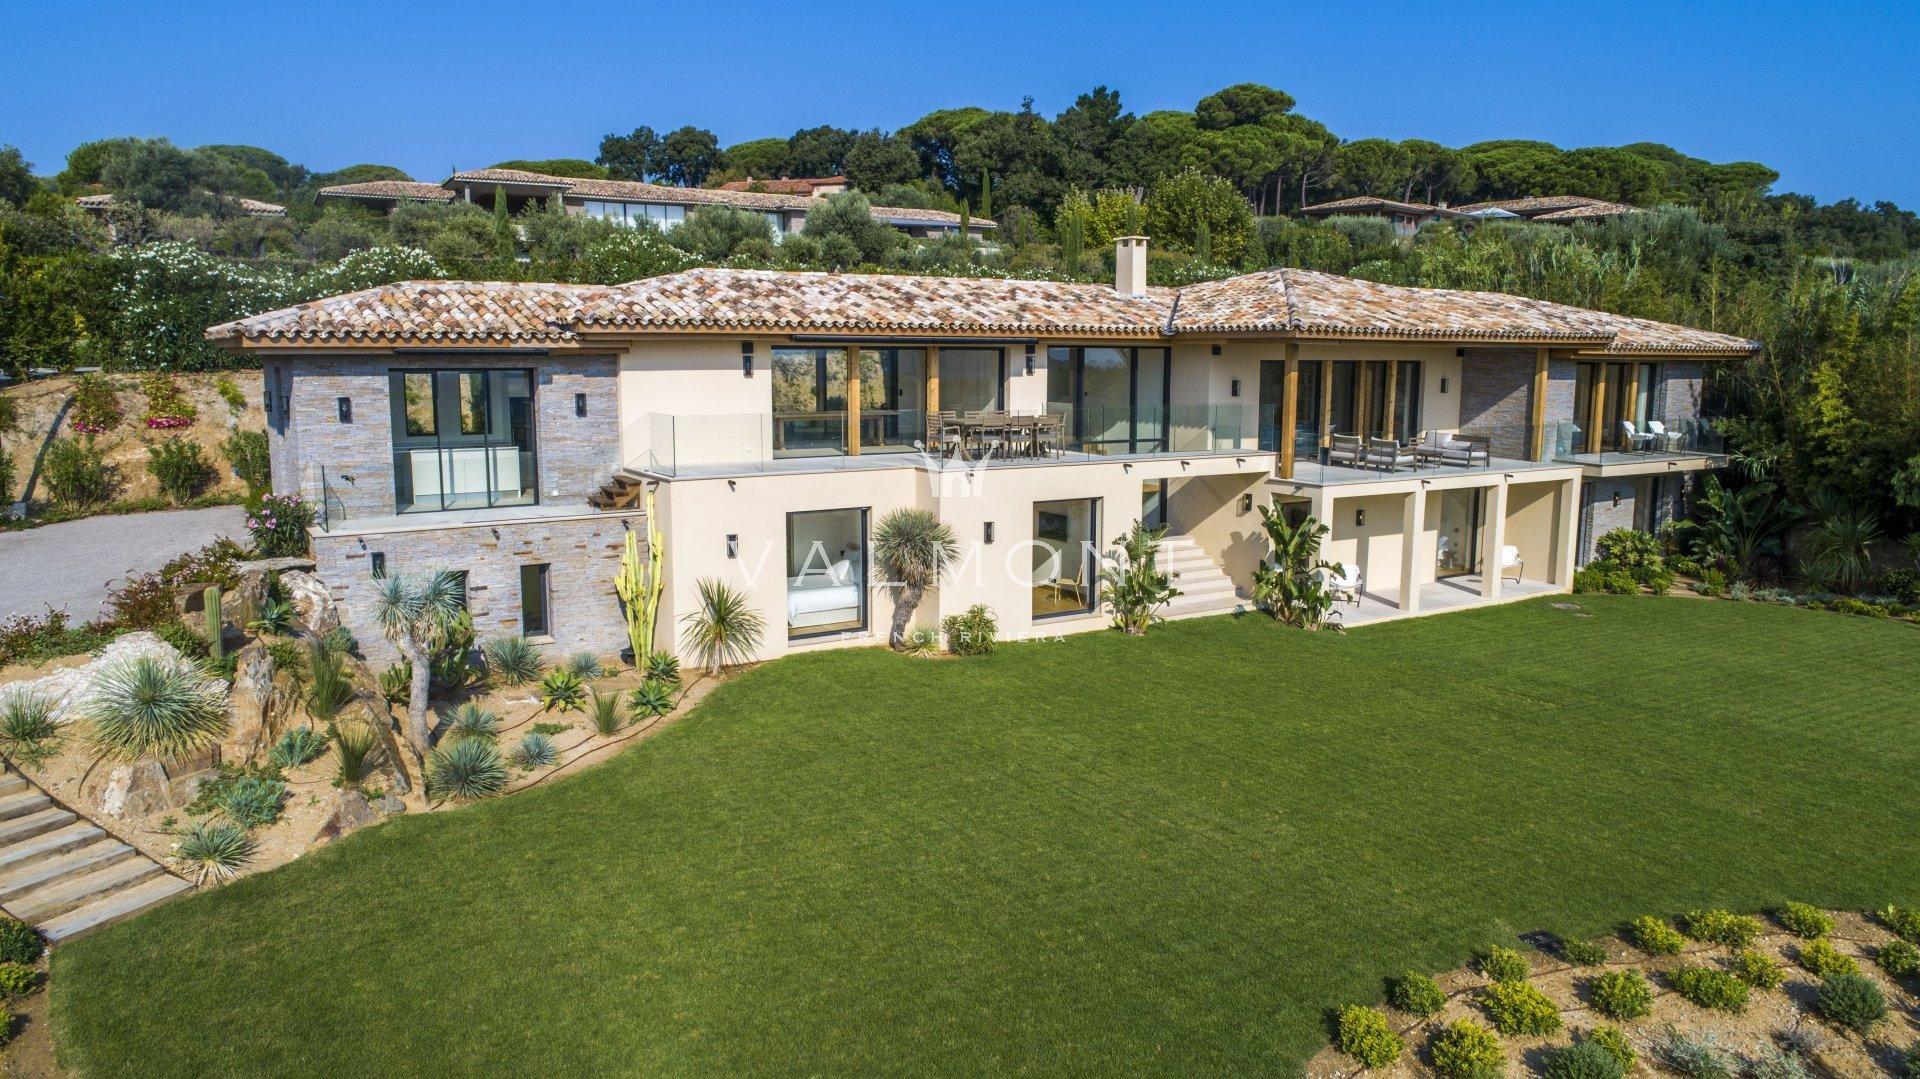 Сезонная аренда Вилла - Сен-Тропе (Saint-Tropez)